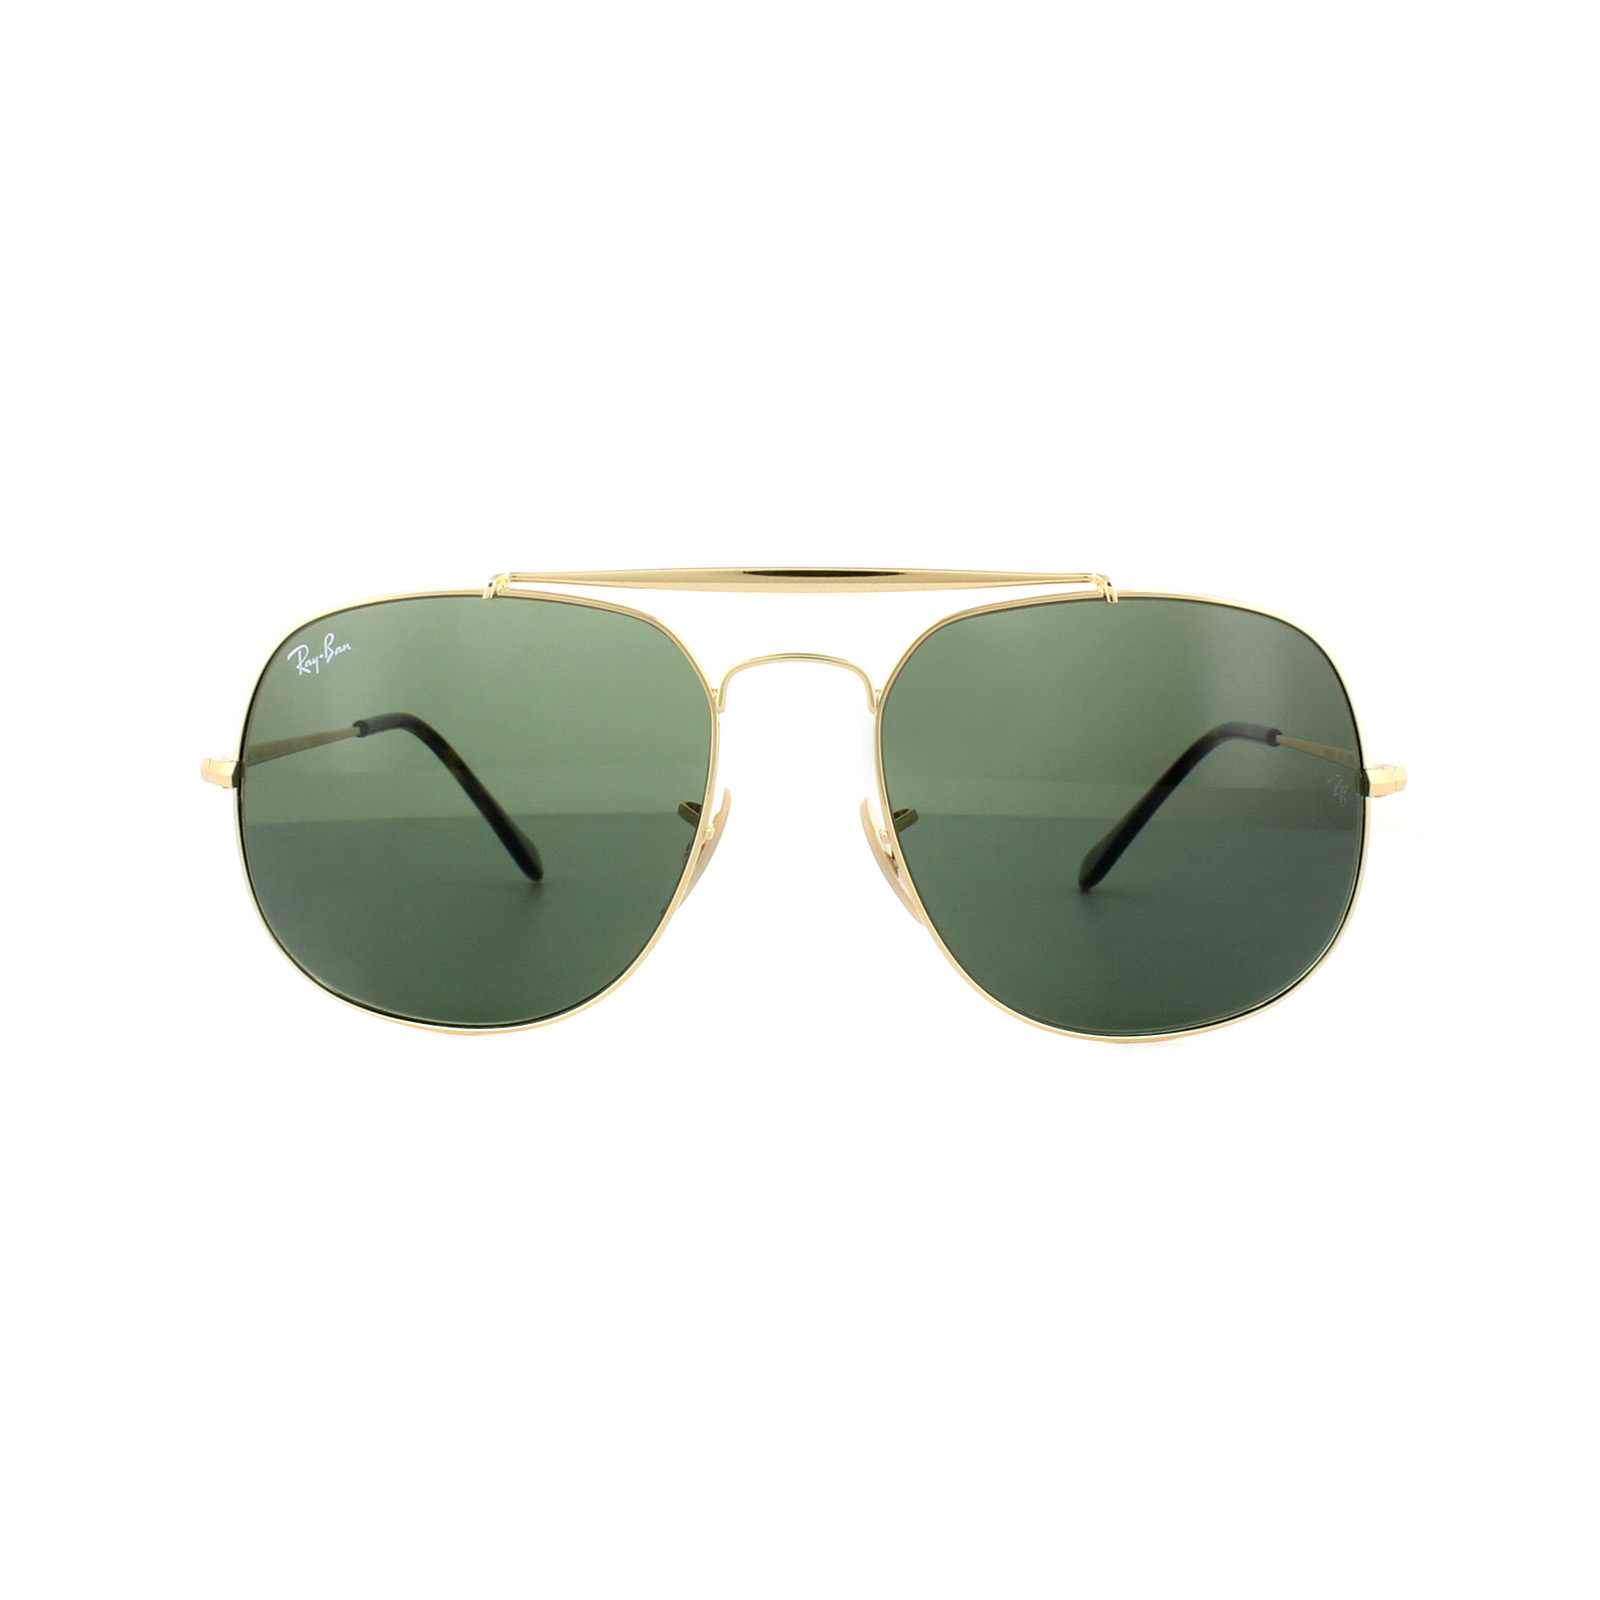 Cheap Ray-Ban General 3561 Sunglasses - Discounted Sunglasses 10dbd09423